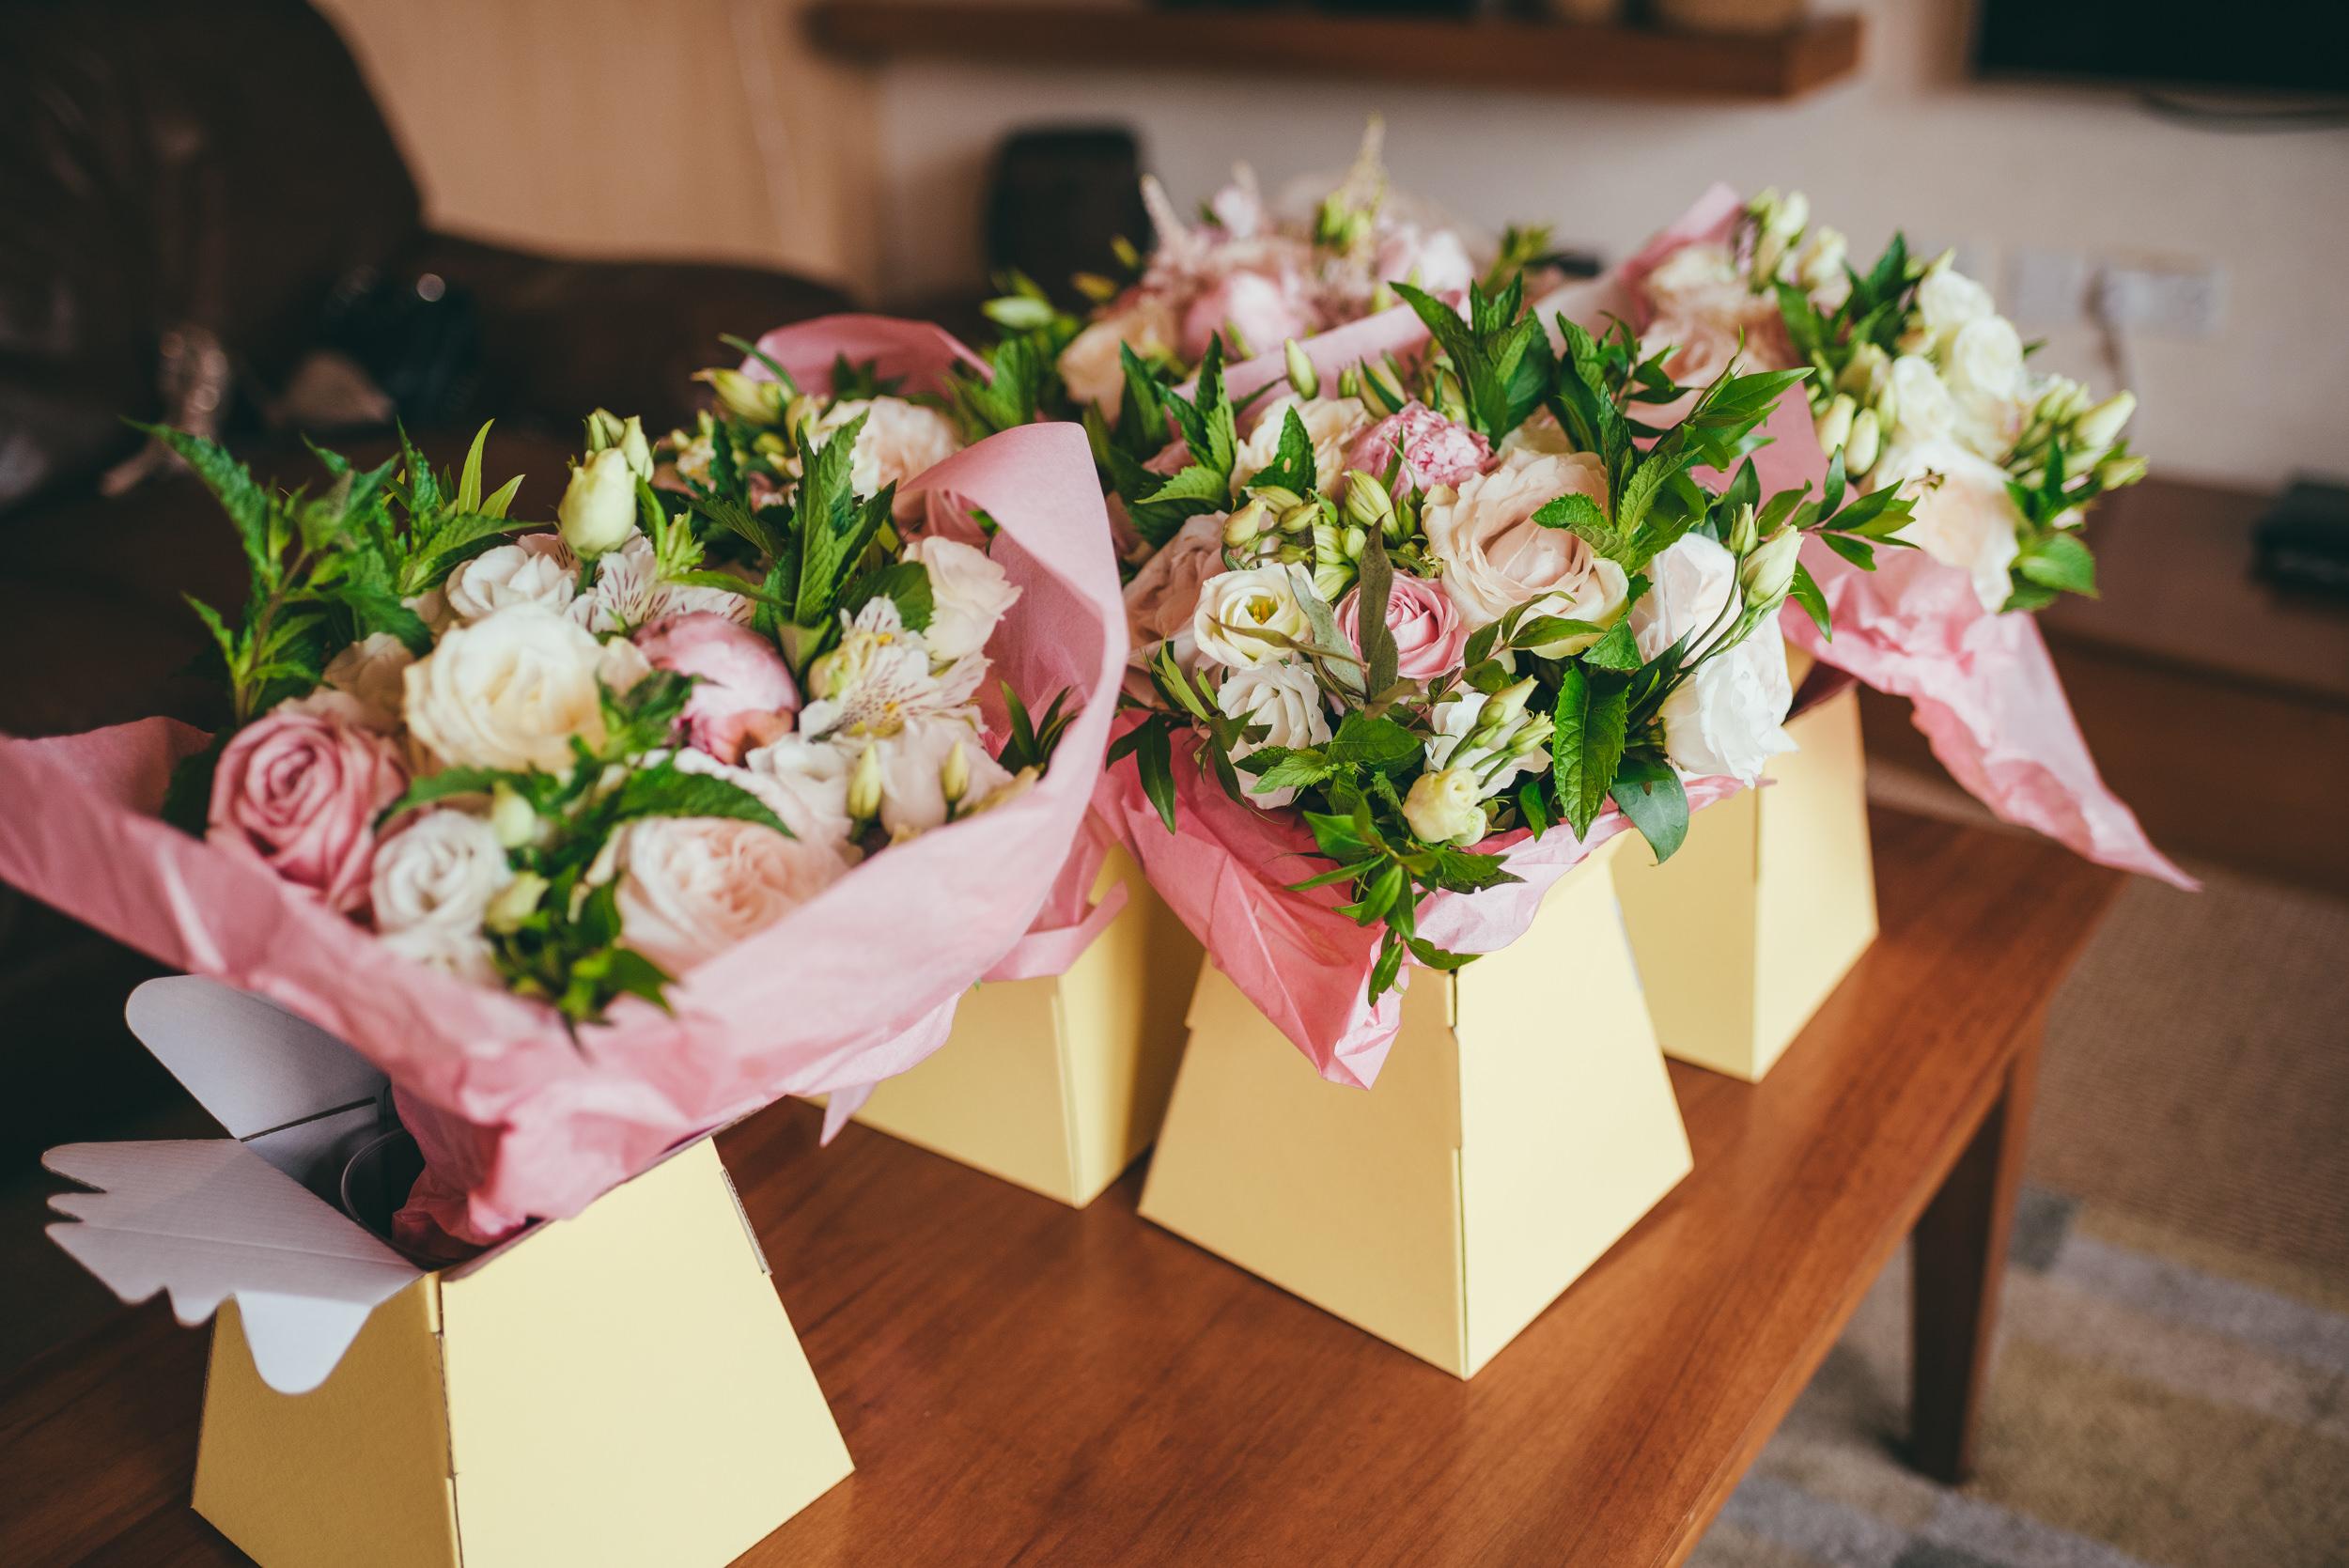 Harlaxton Manor Wedding bouquets